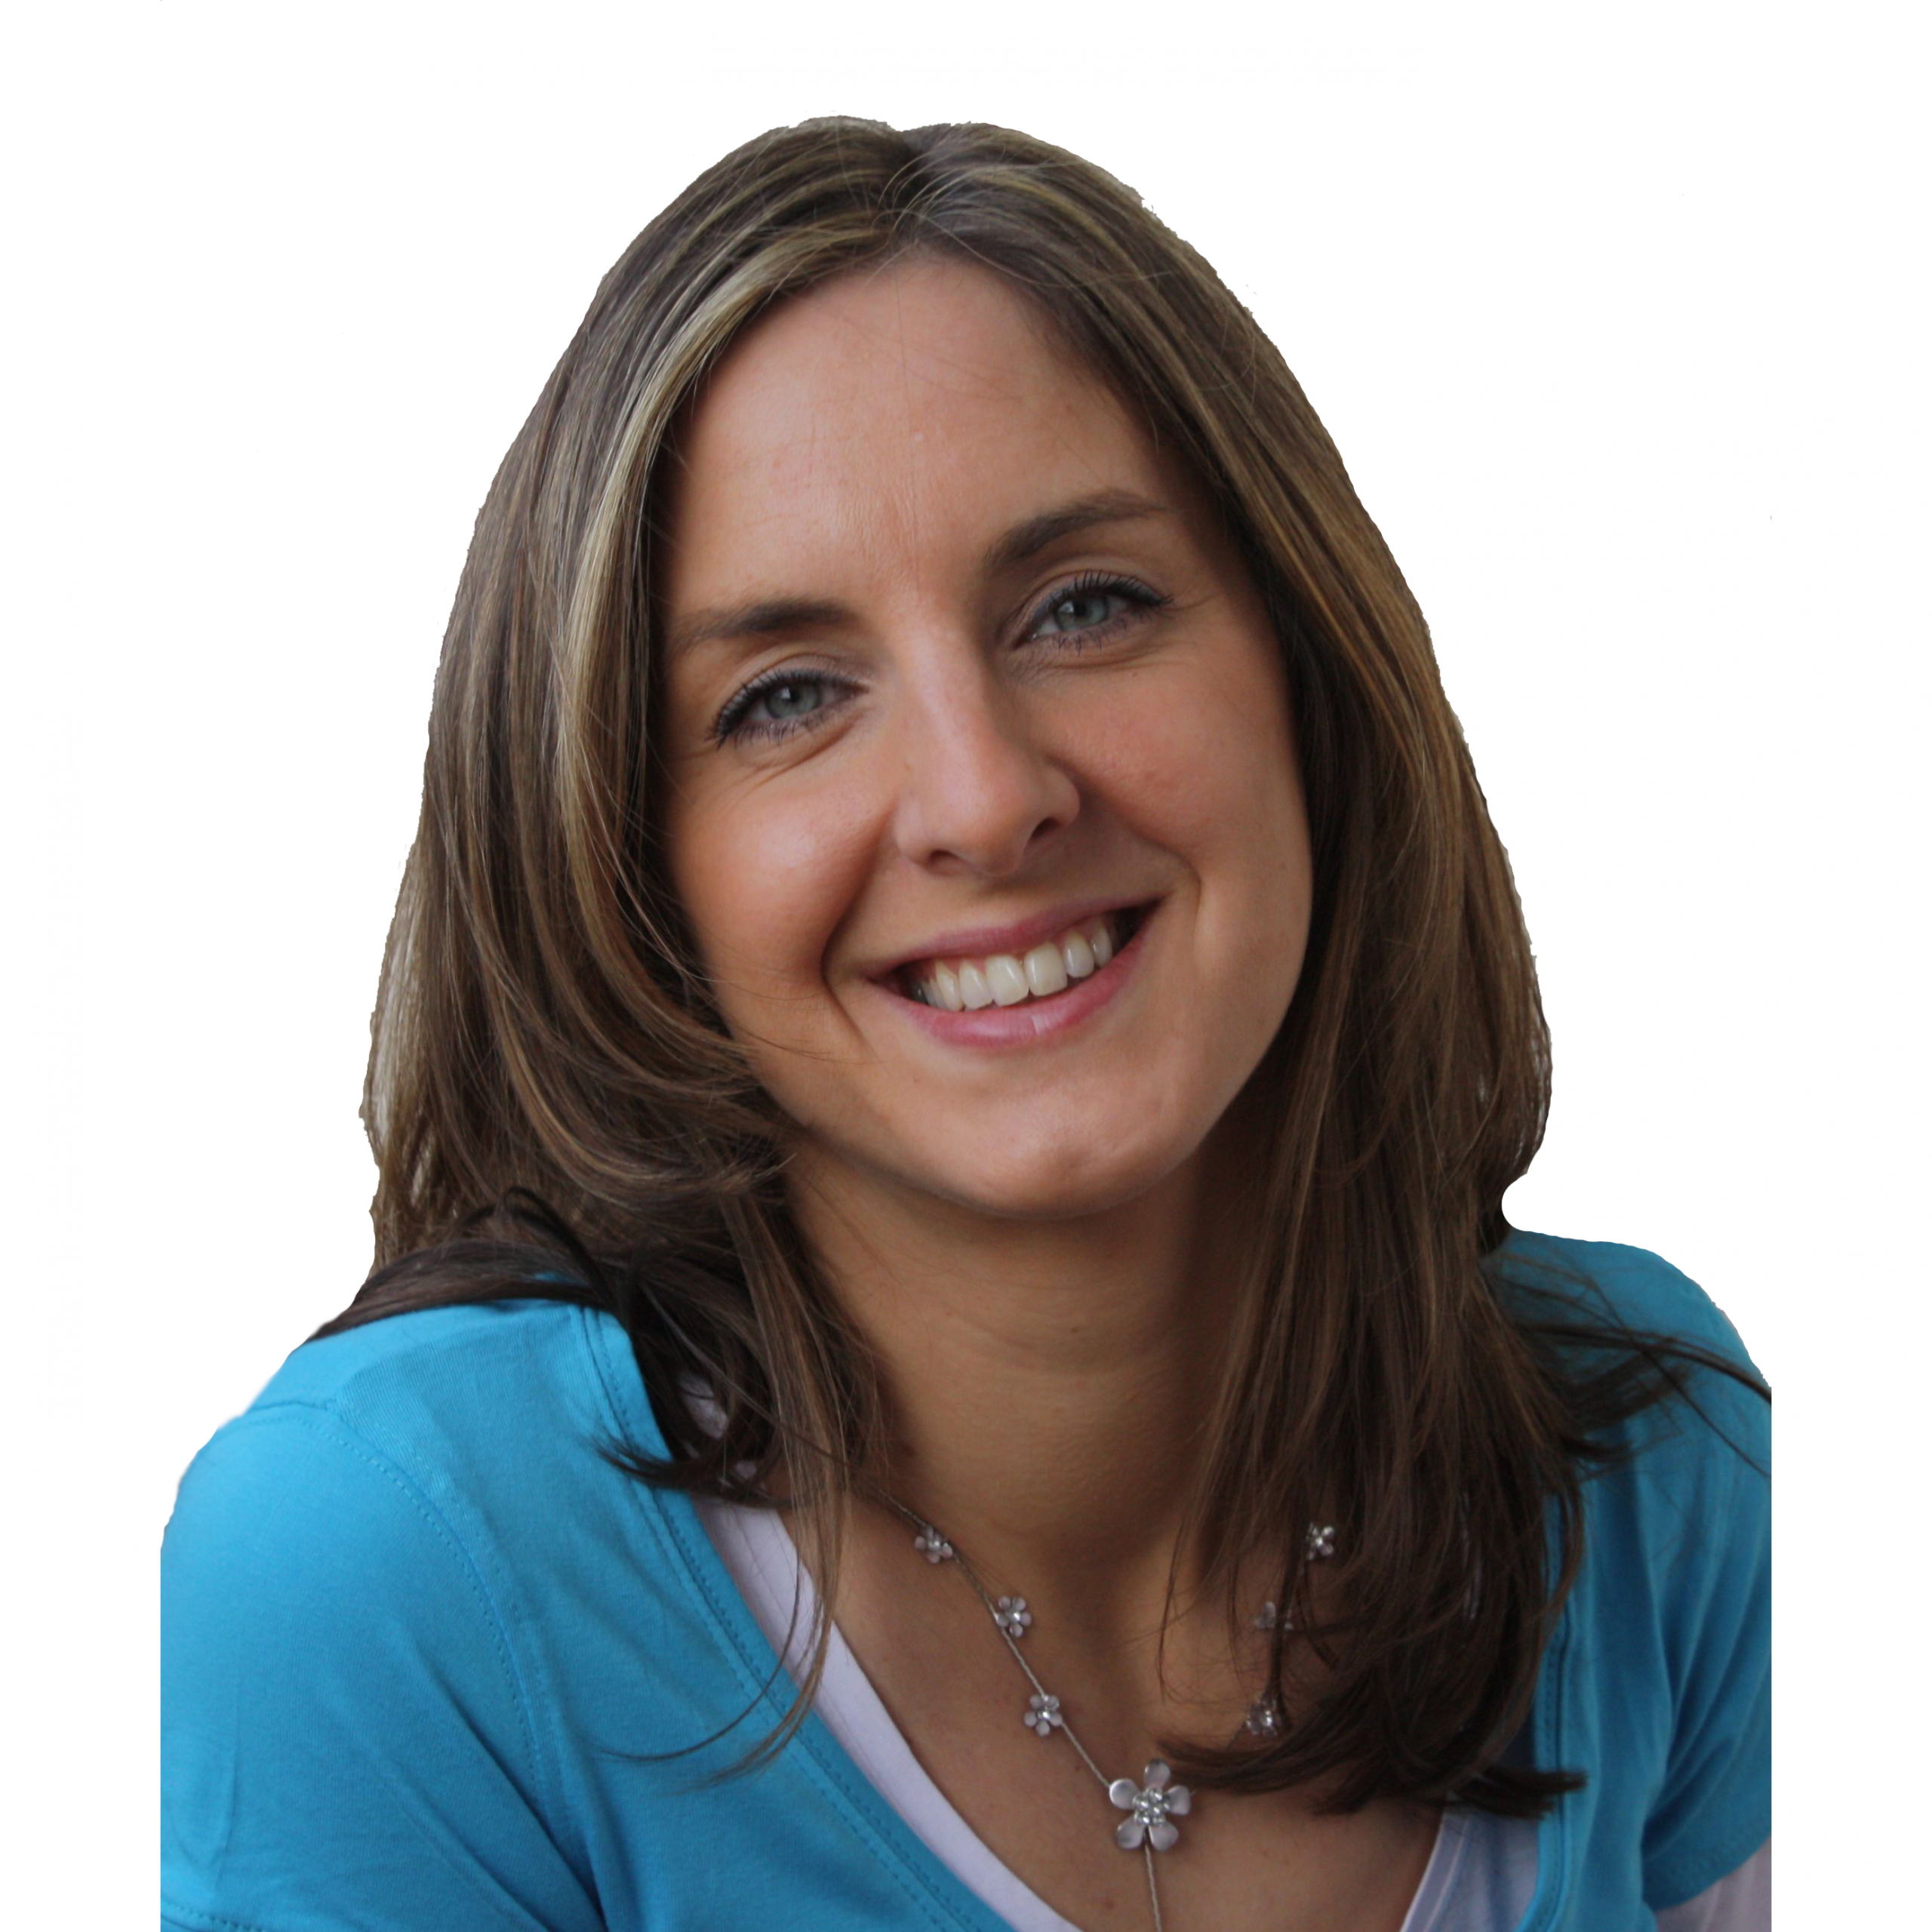 Marina Hein VP Marketing and HR smartPM.solutions